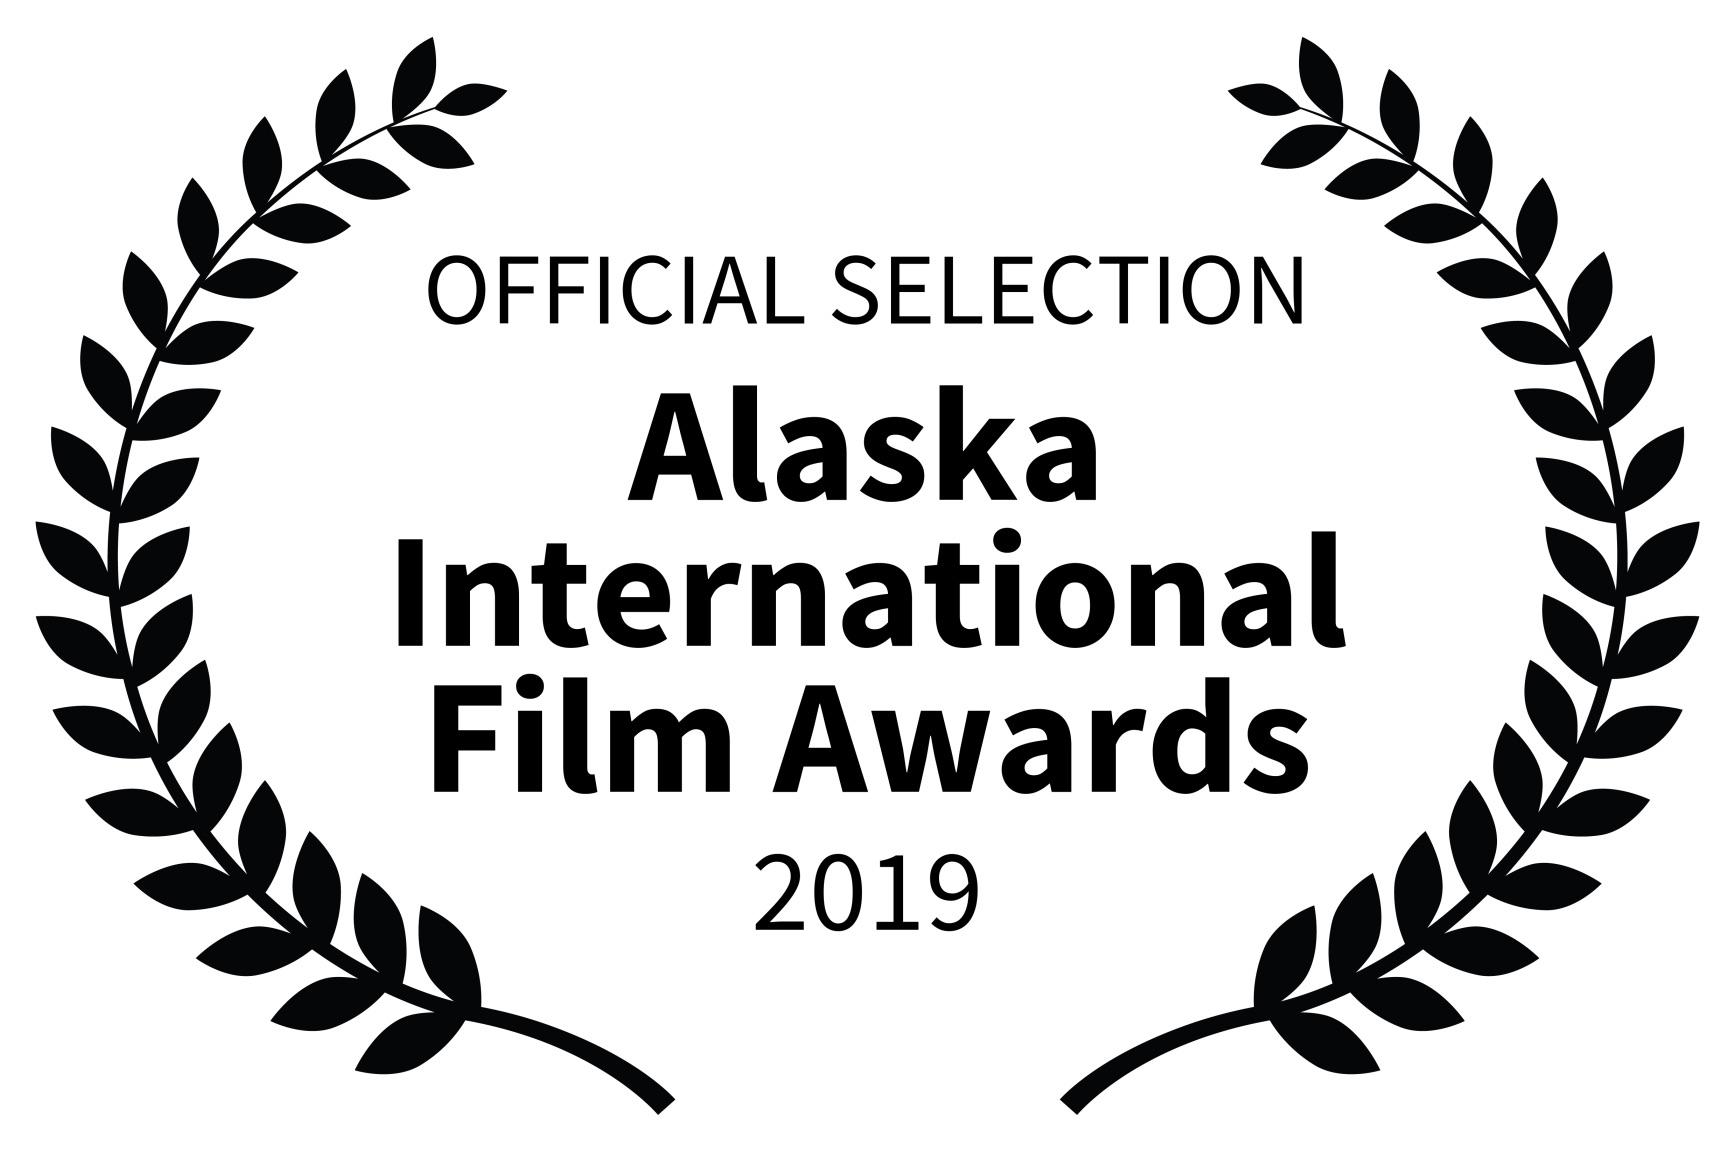 OFFICIAL SELECTION - Alaska International Film Awards - 2019